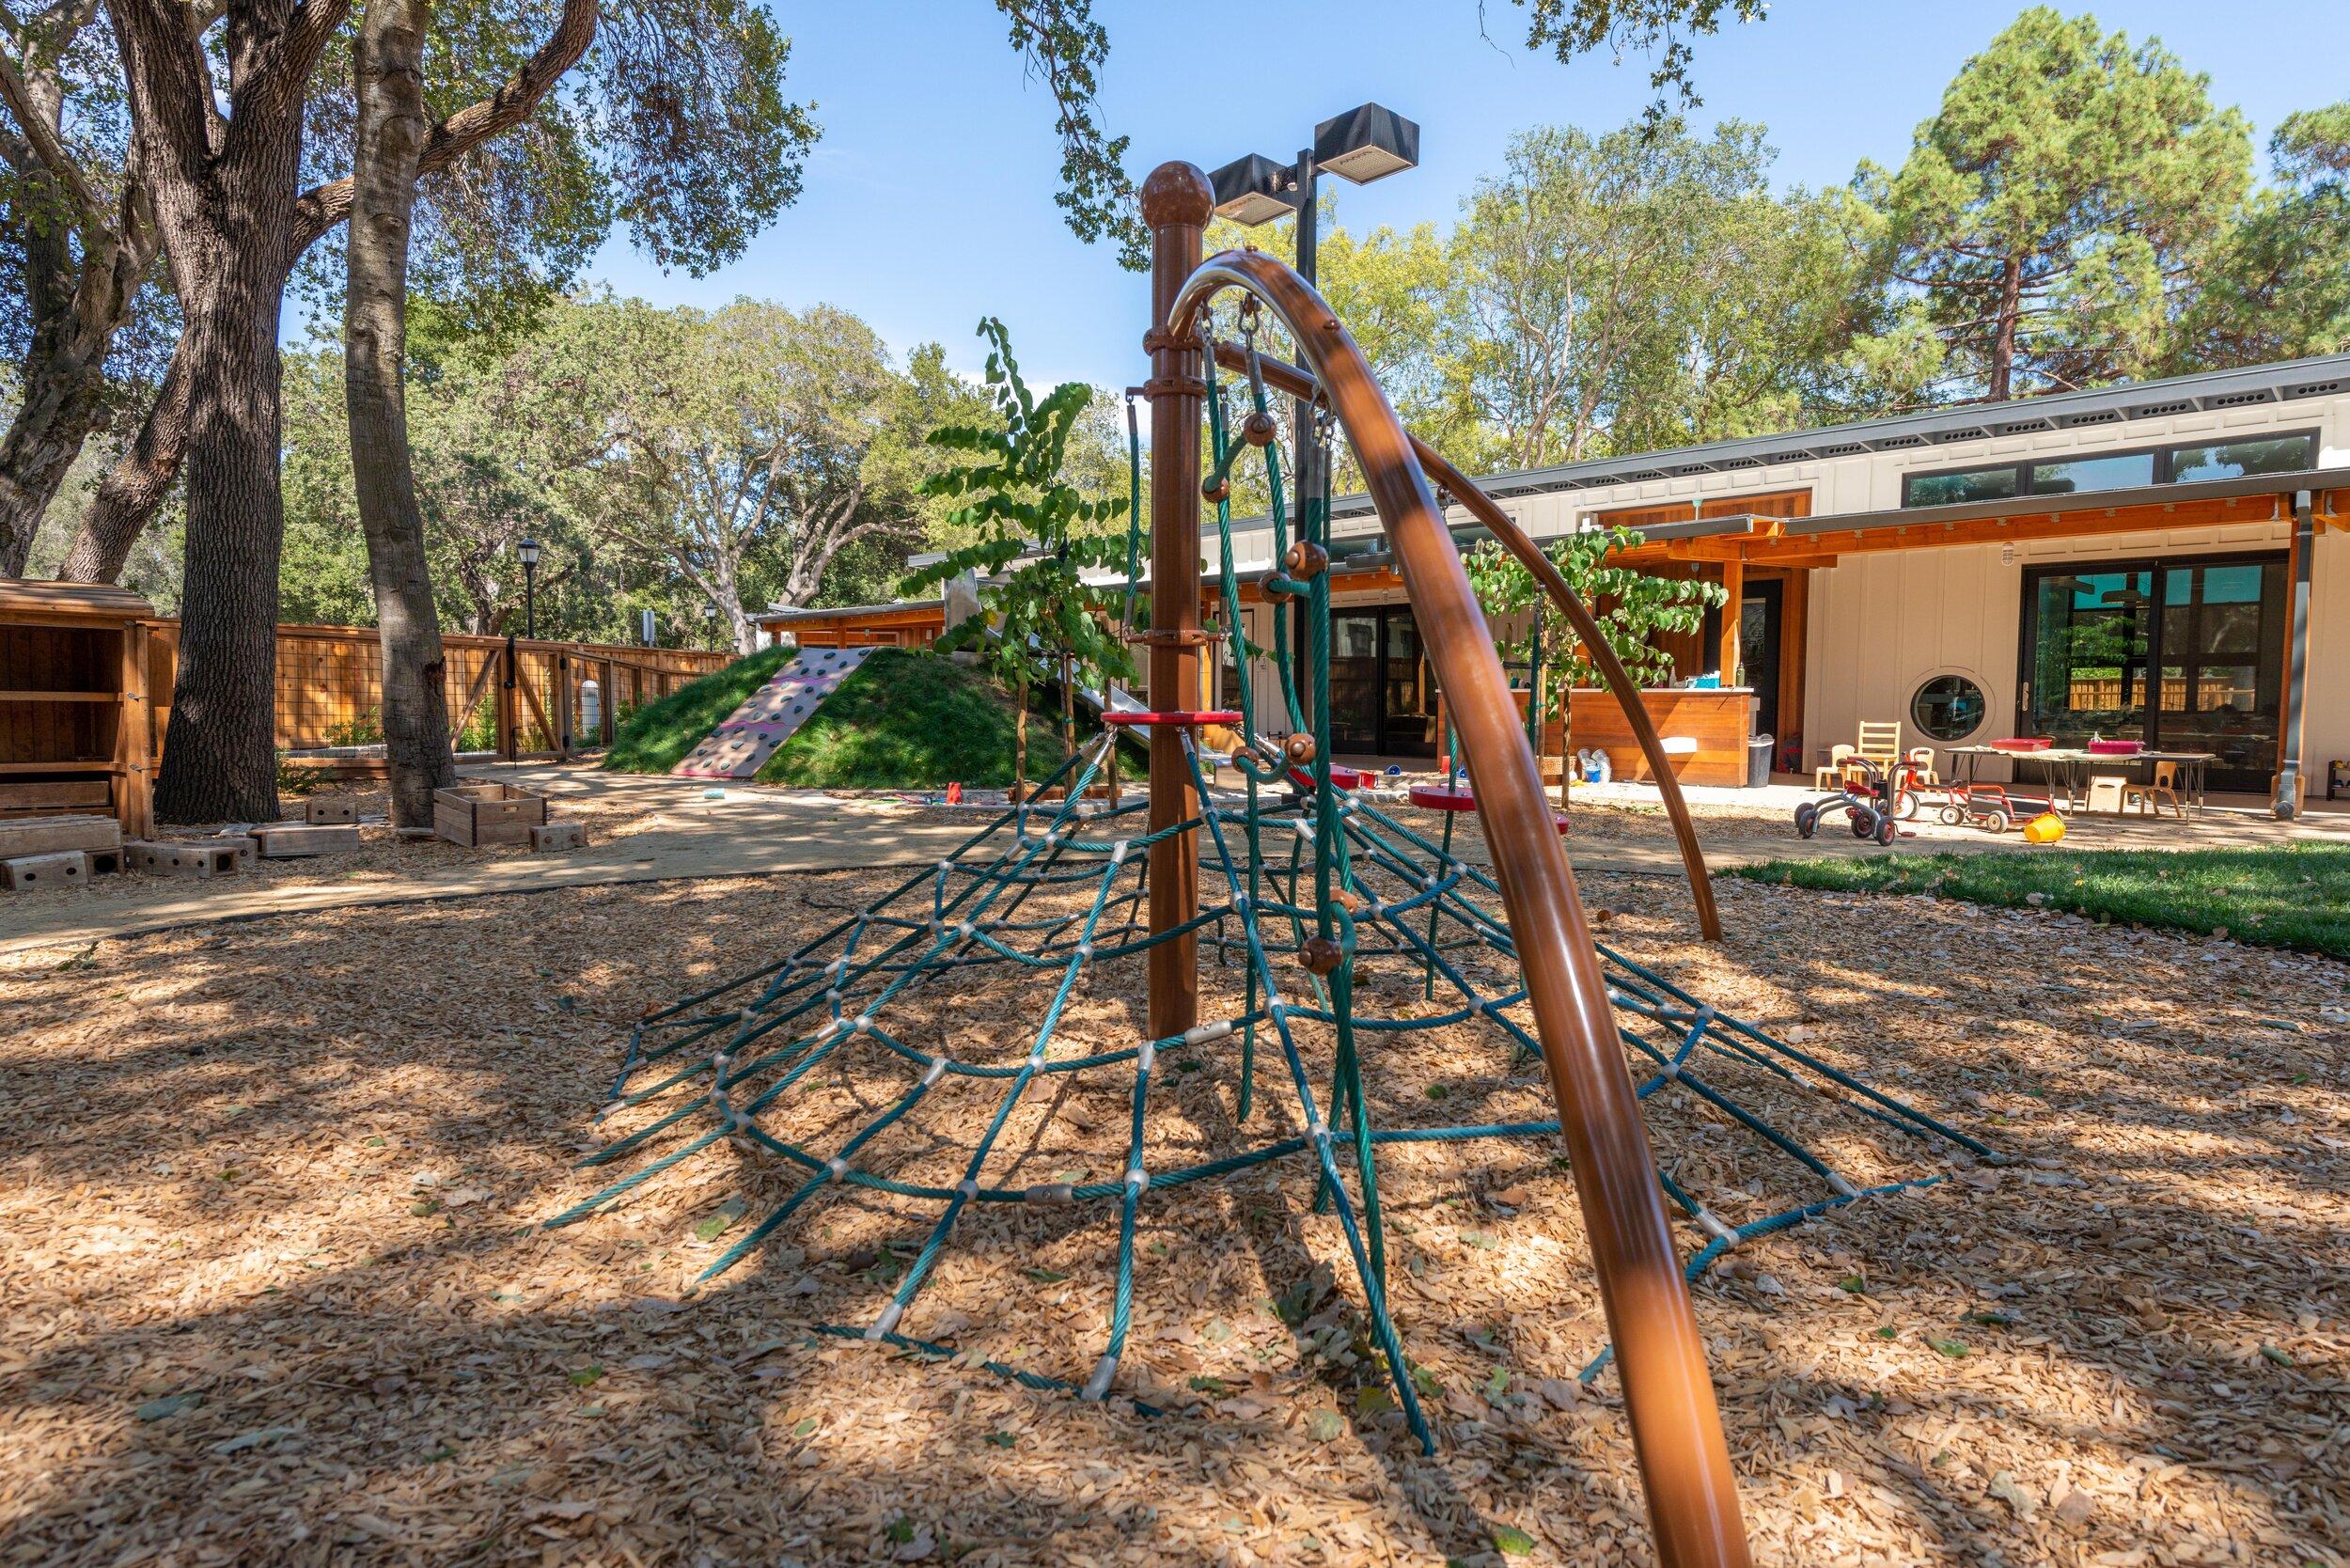 Childrens_Center_of_Stanford_Community_Preschool-46_lo.jpg